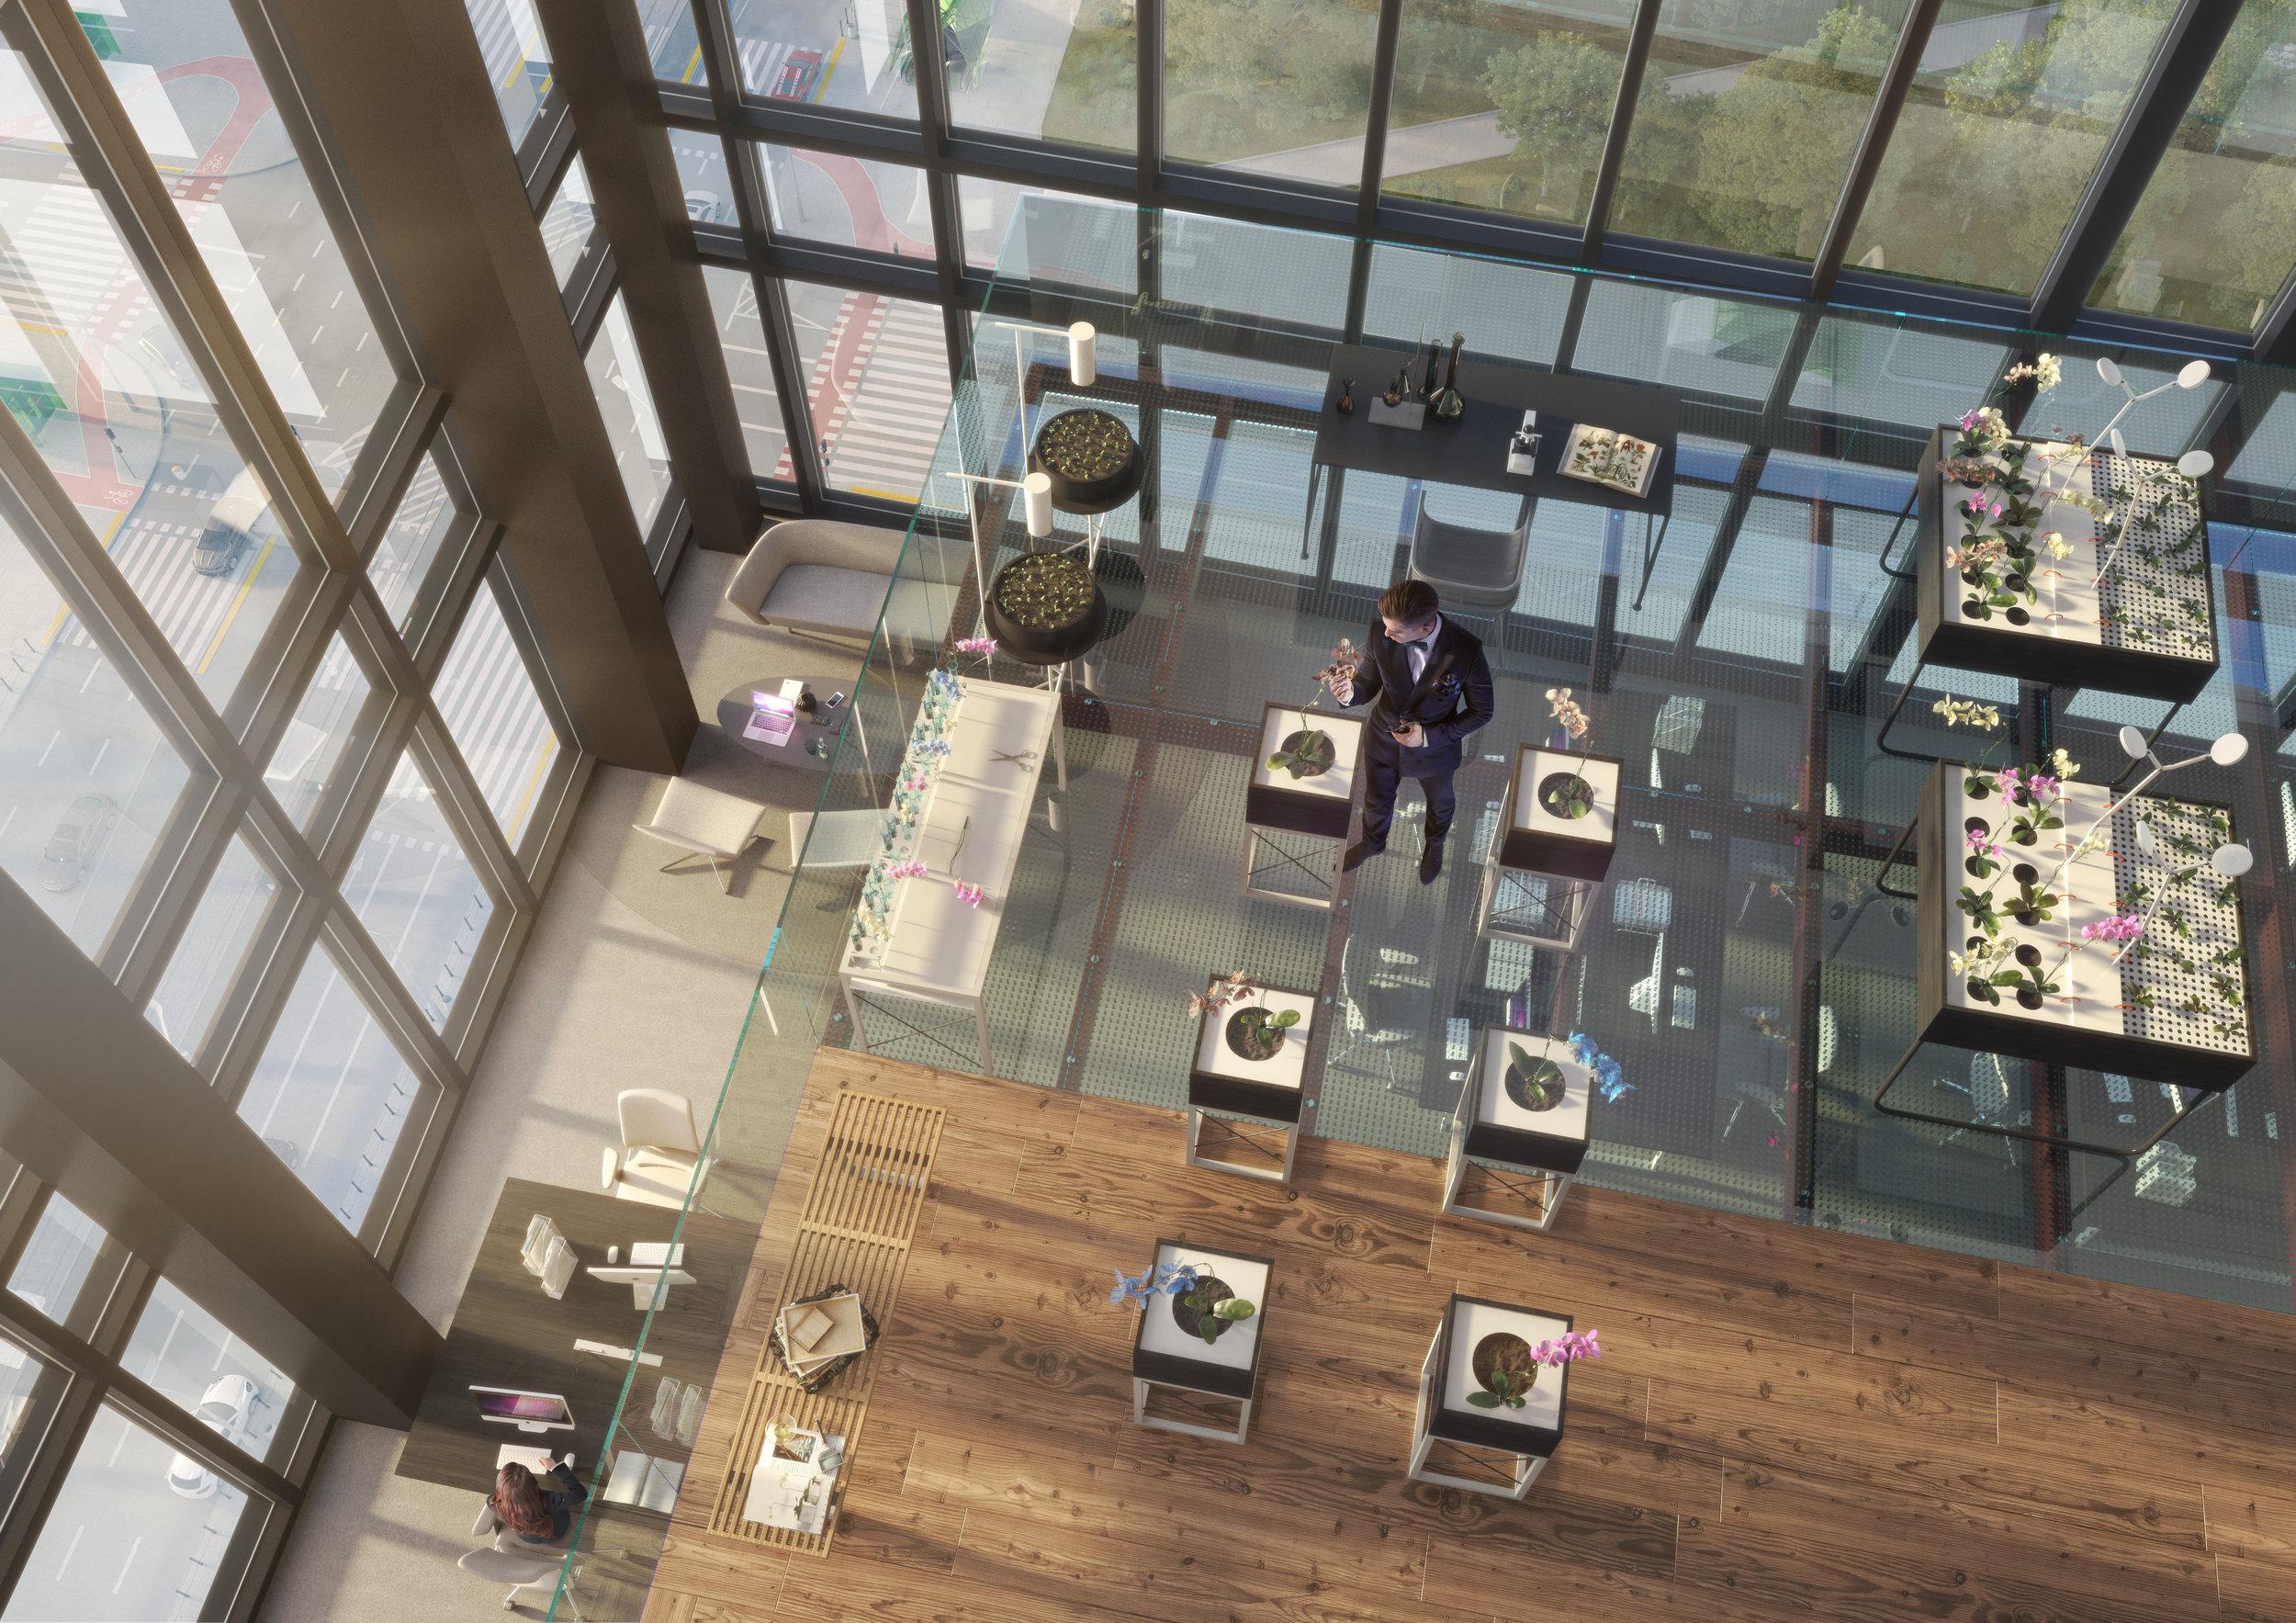 2016 Immobel CBD1 Premium Office.jpg